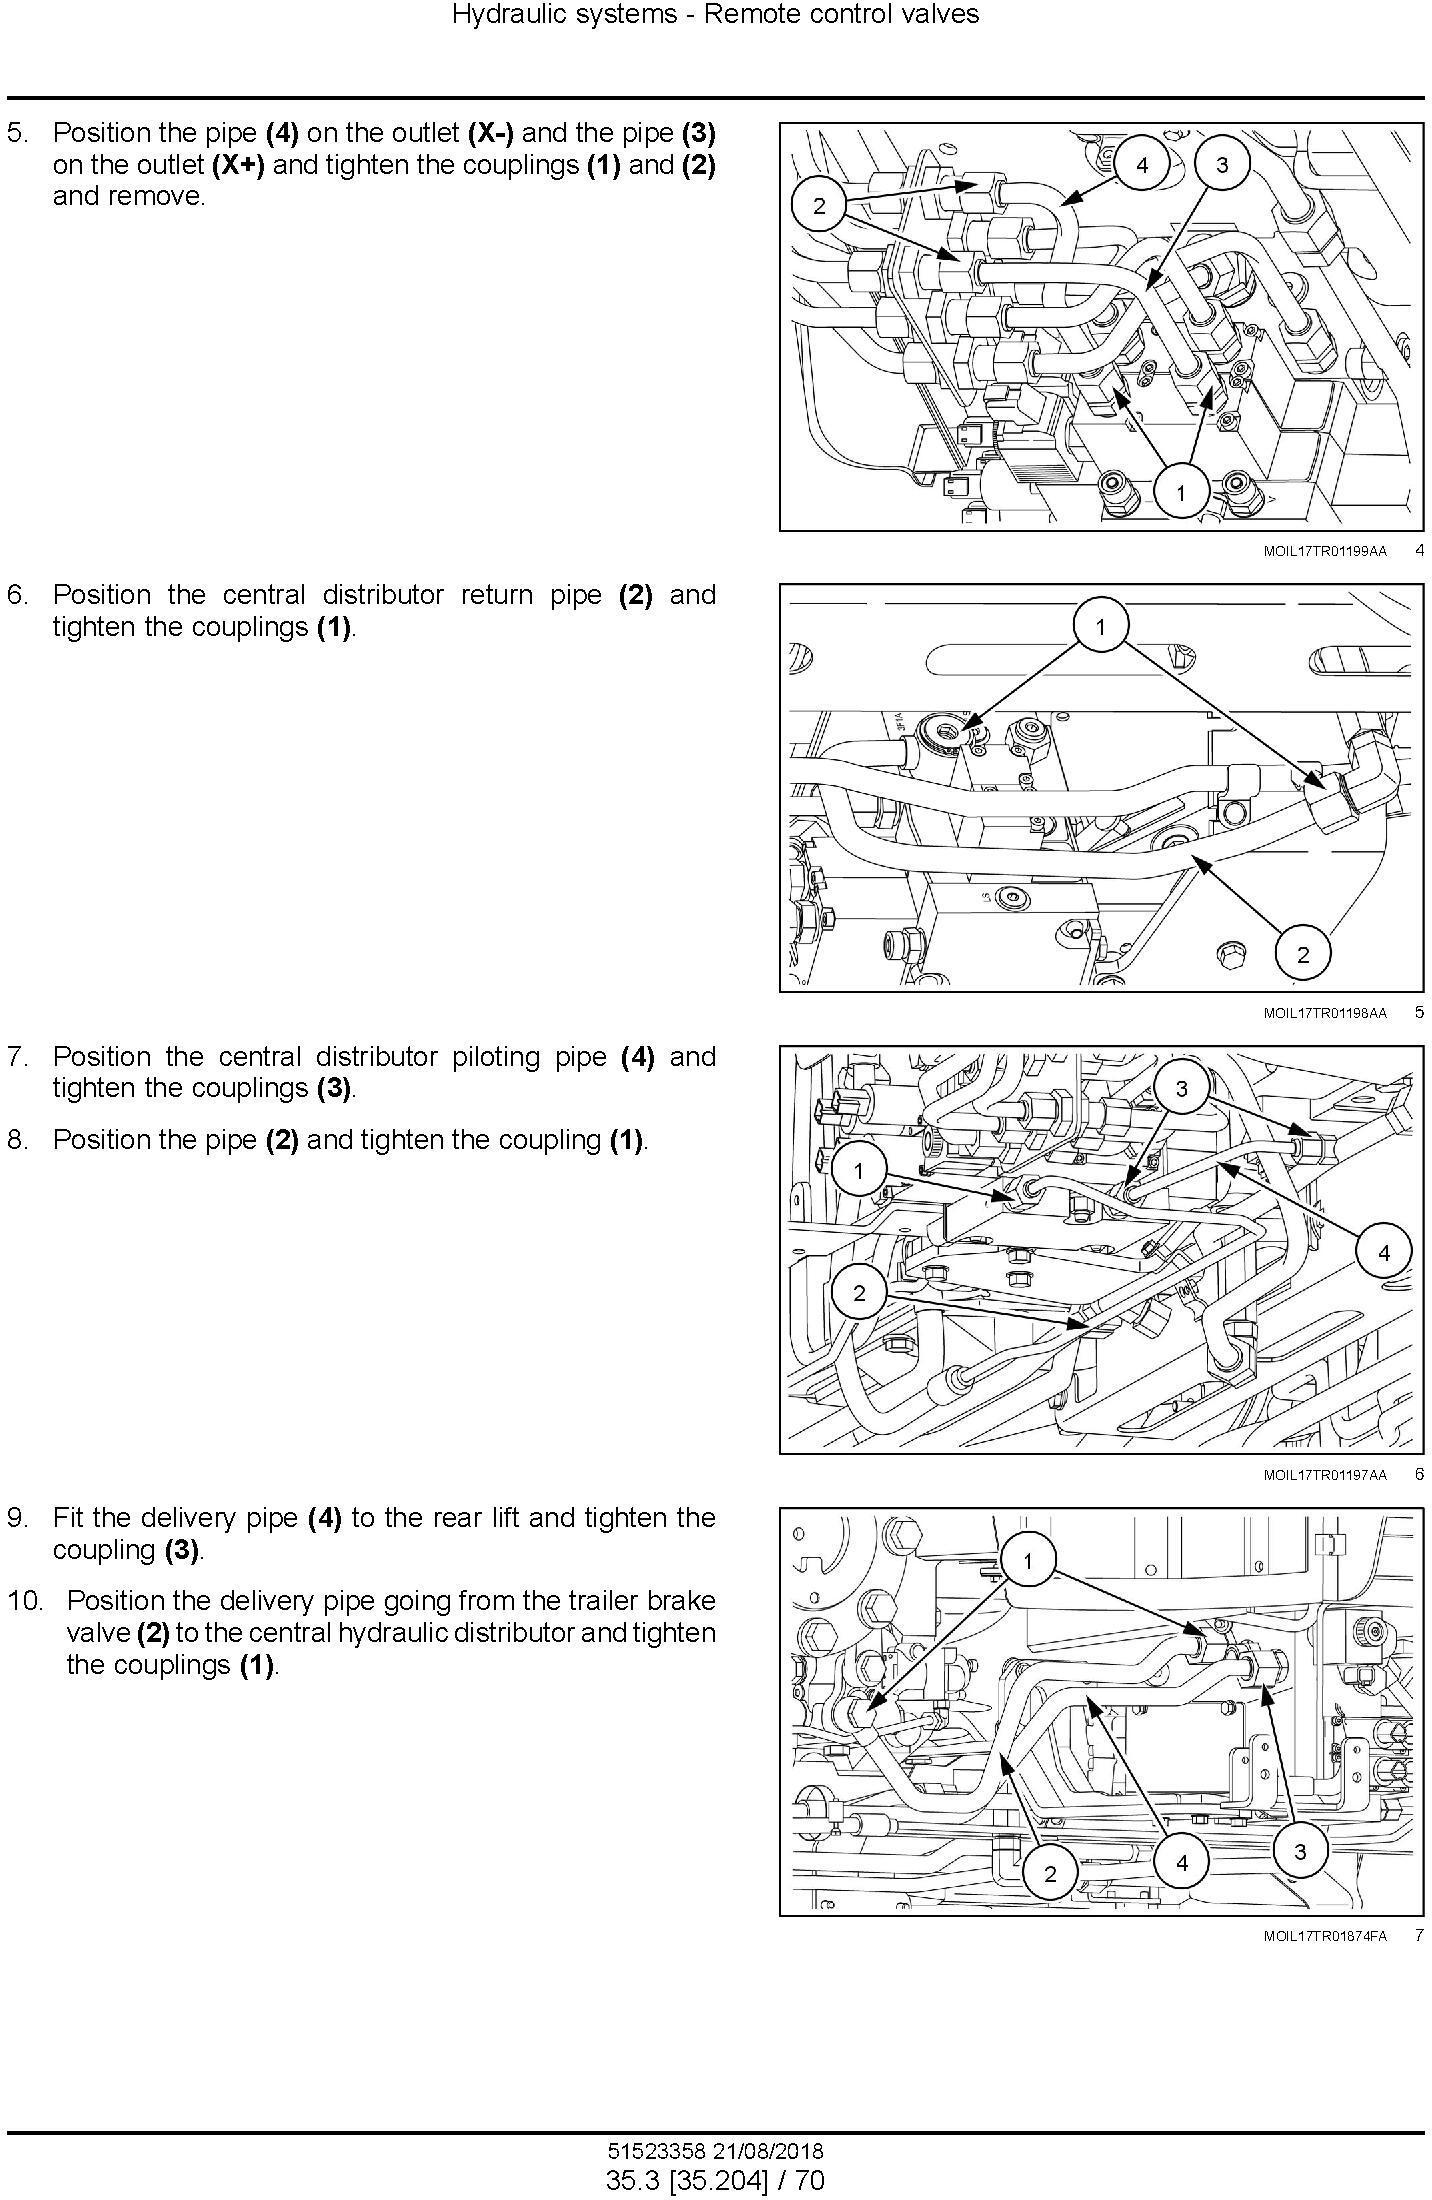 New Holland T4.80F/LP, T4.90F/LP, T4.100F/LP, T4.110F/LP Tractor Service Manual (Europe,Asia,Africa) - 3